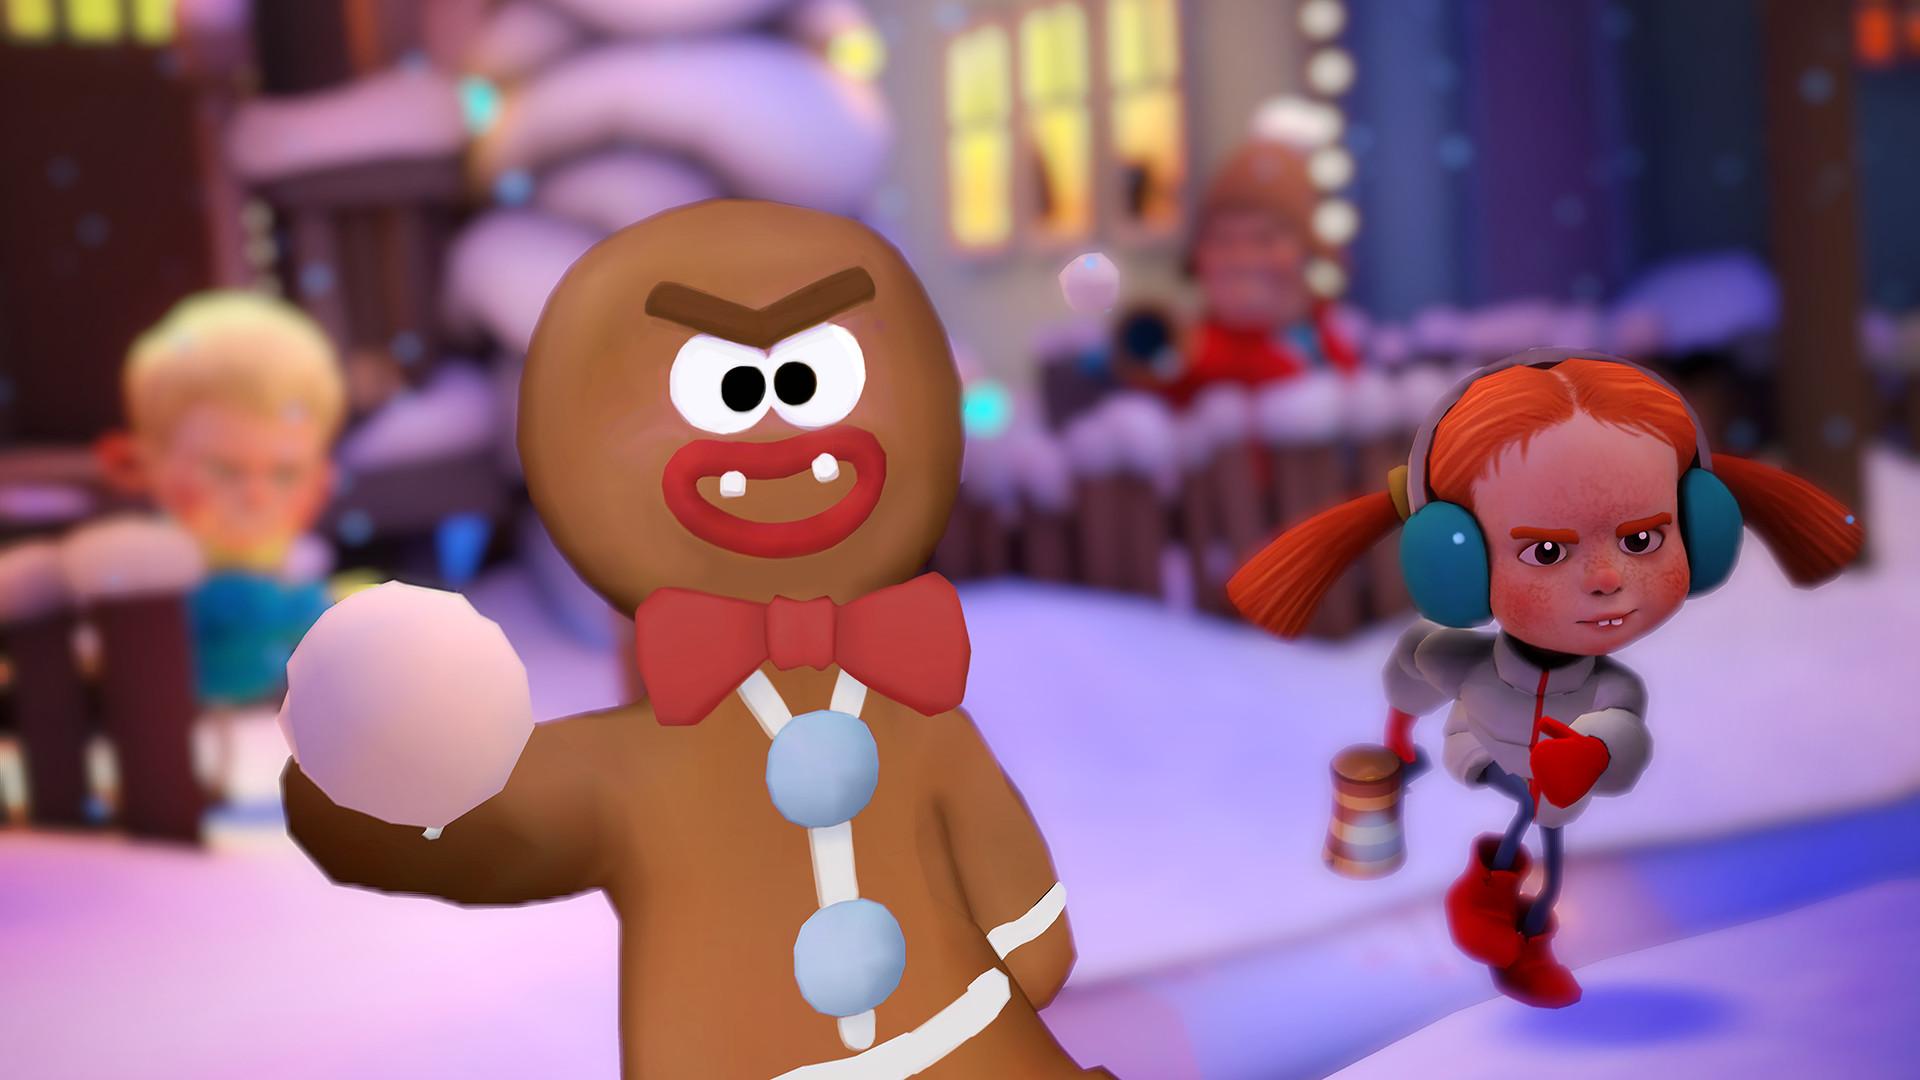 "Znalezione obrazy dlazapytania: Merry Snowballs"""